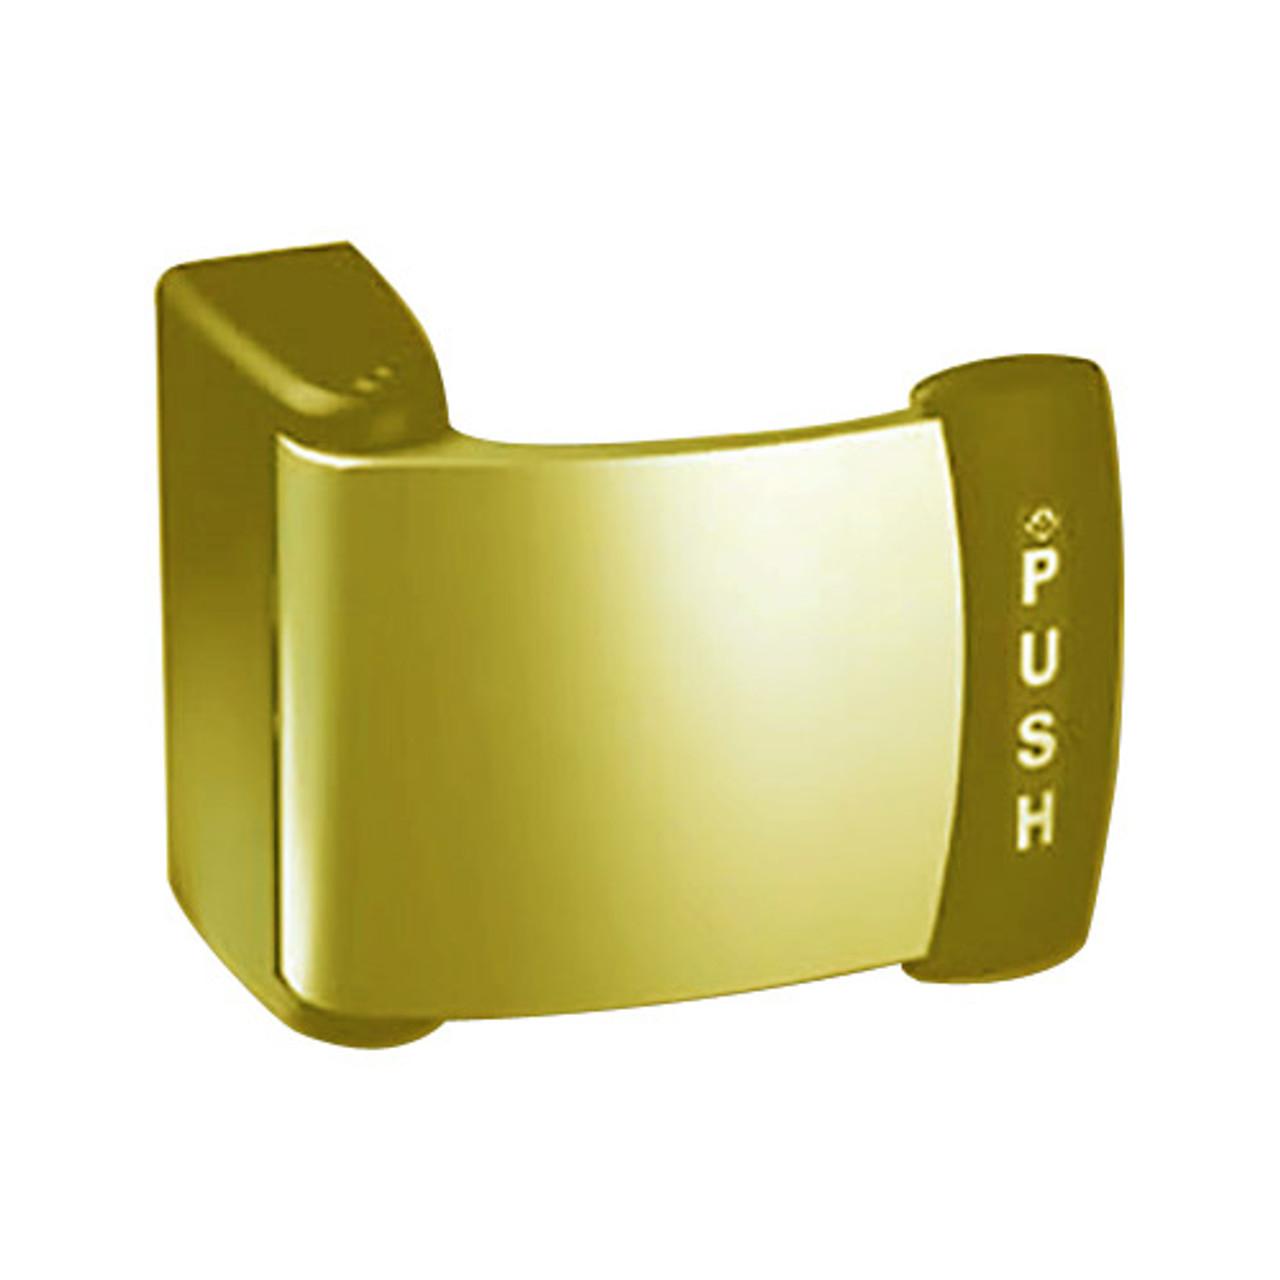 4591MA-04-00-US3 Adams Rite Deadlatch Paddle in Bright Brass Finish